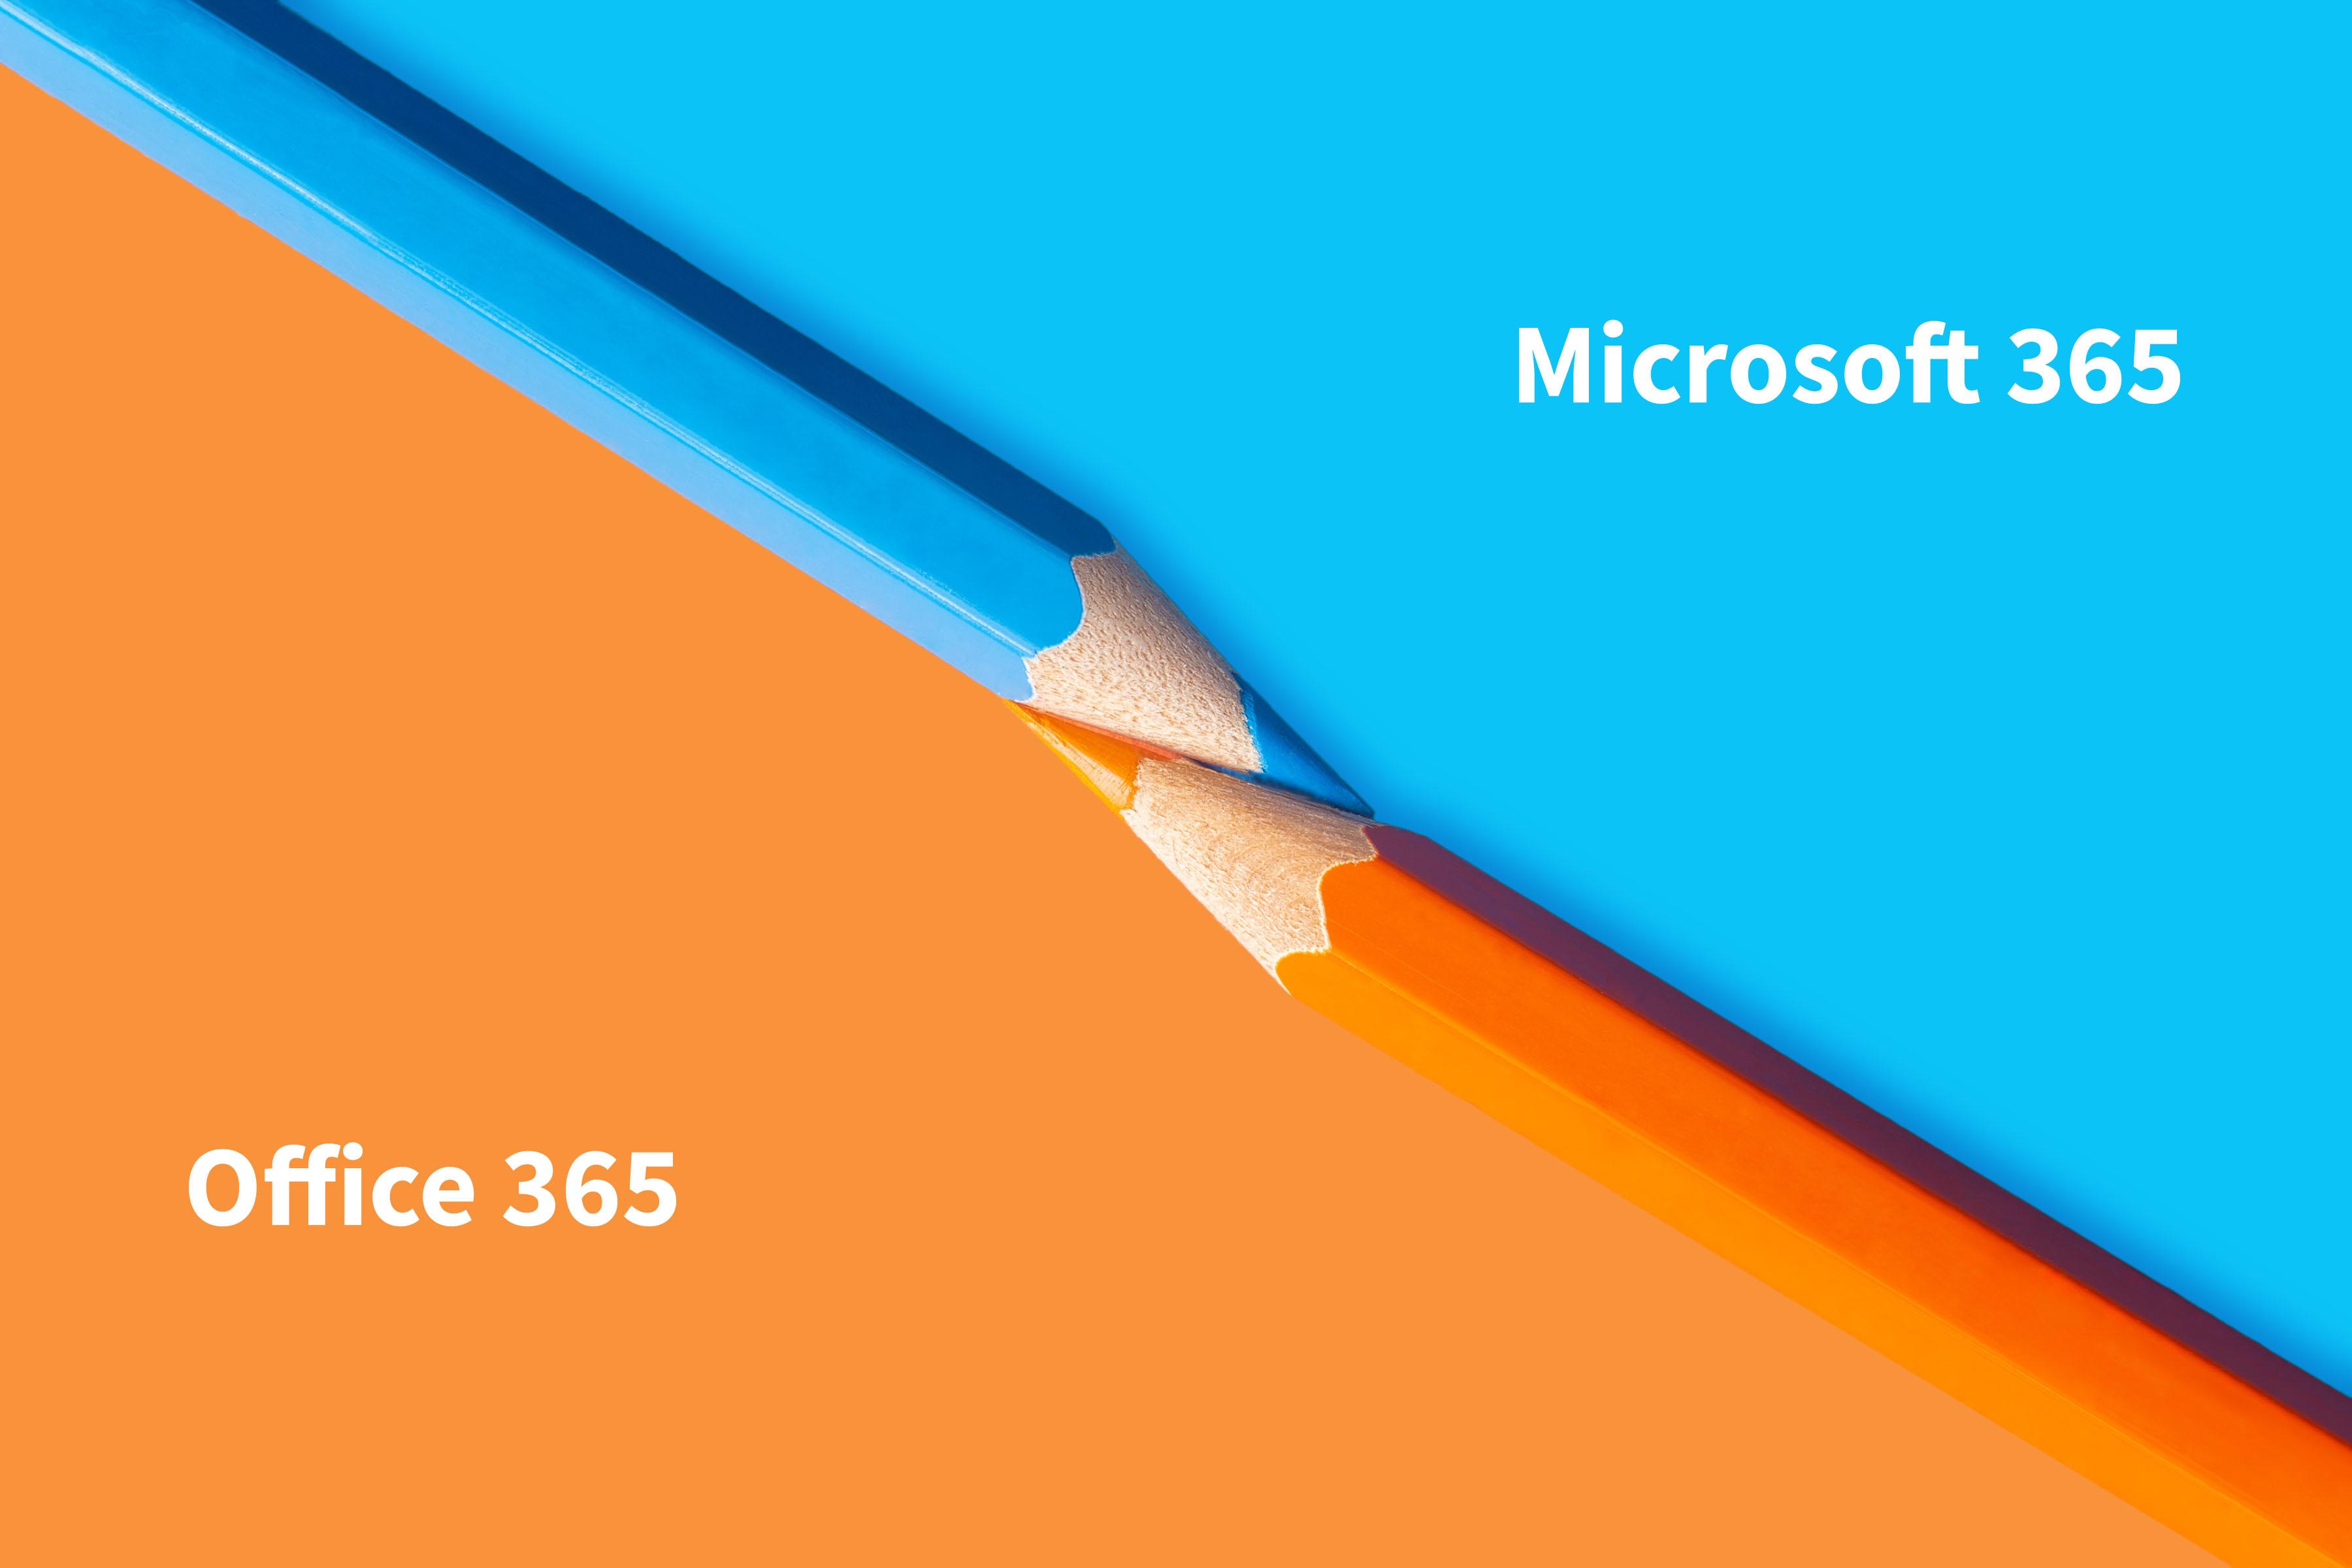 Office 365 vs. Microsoft 365 – vertailimme palveluja